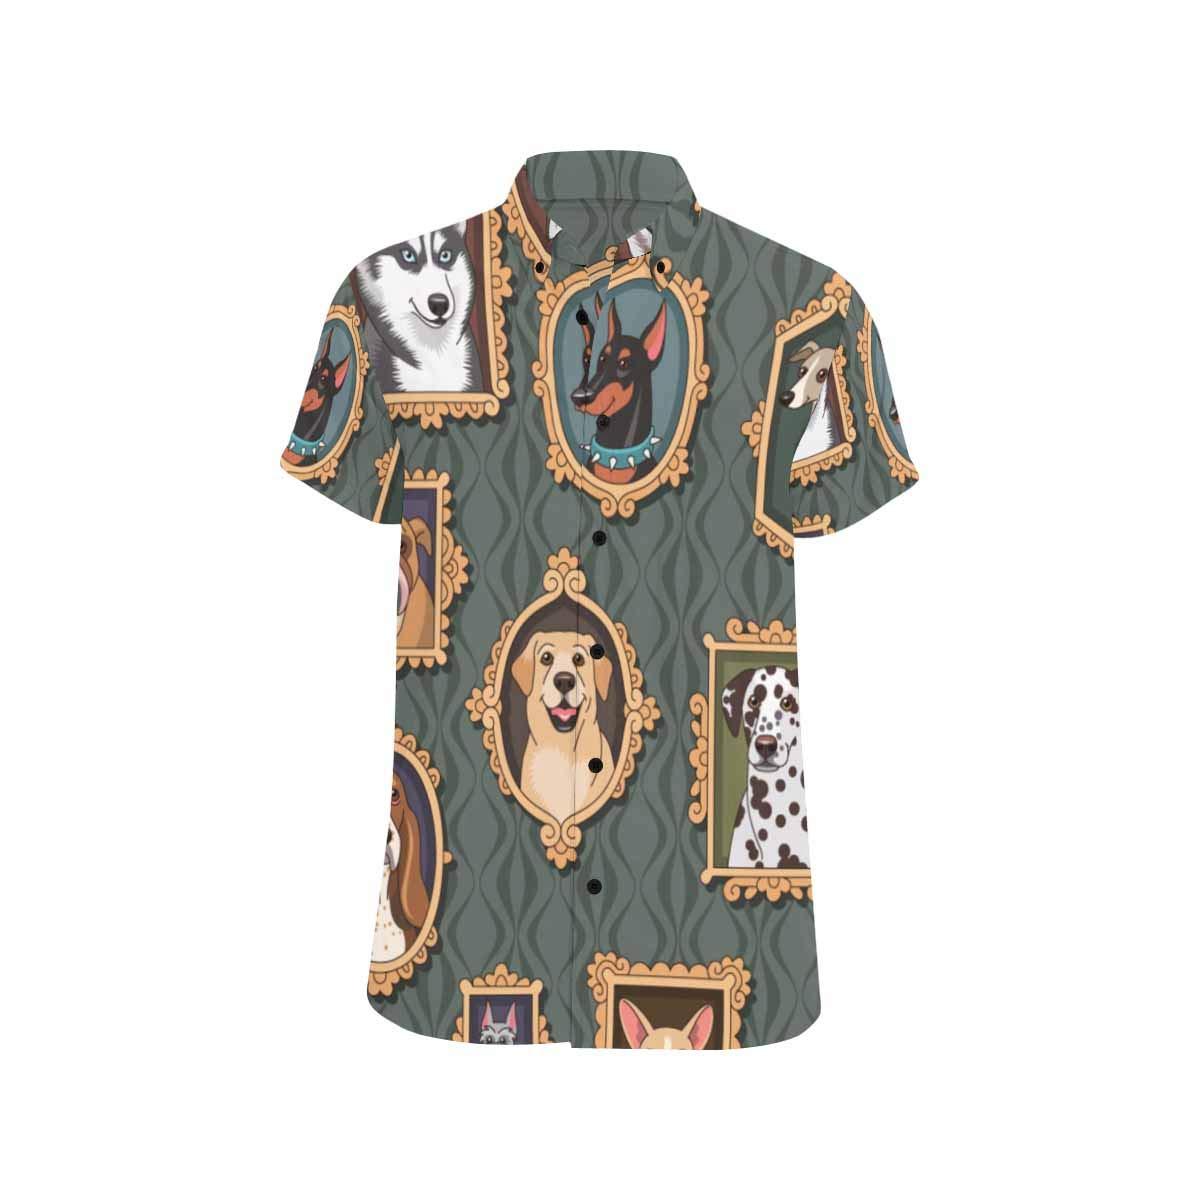 InterestPrint Men Botton Up T-Shirt Cute Unicorn Shine Stars Sparkles Flash Regular Fit T-Shirts S-5XL